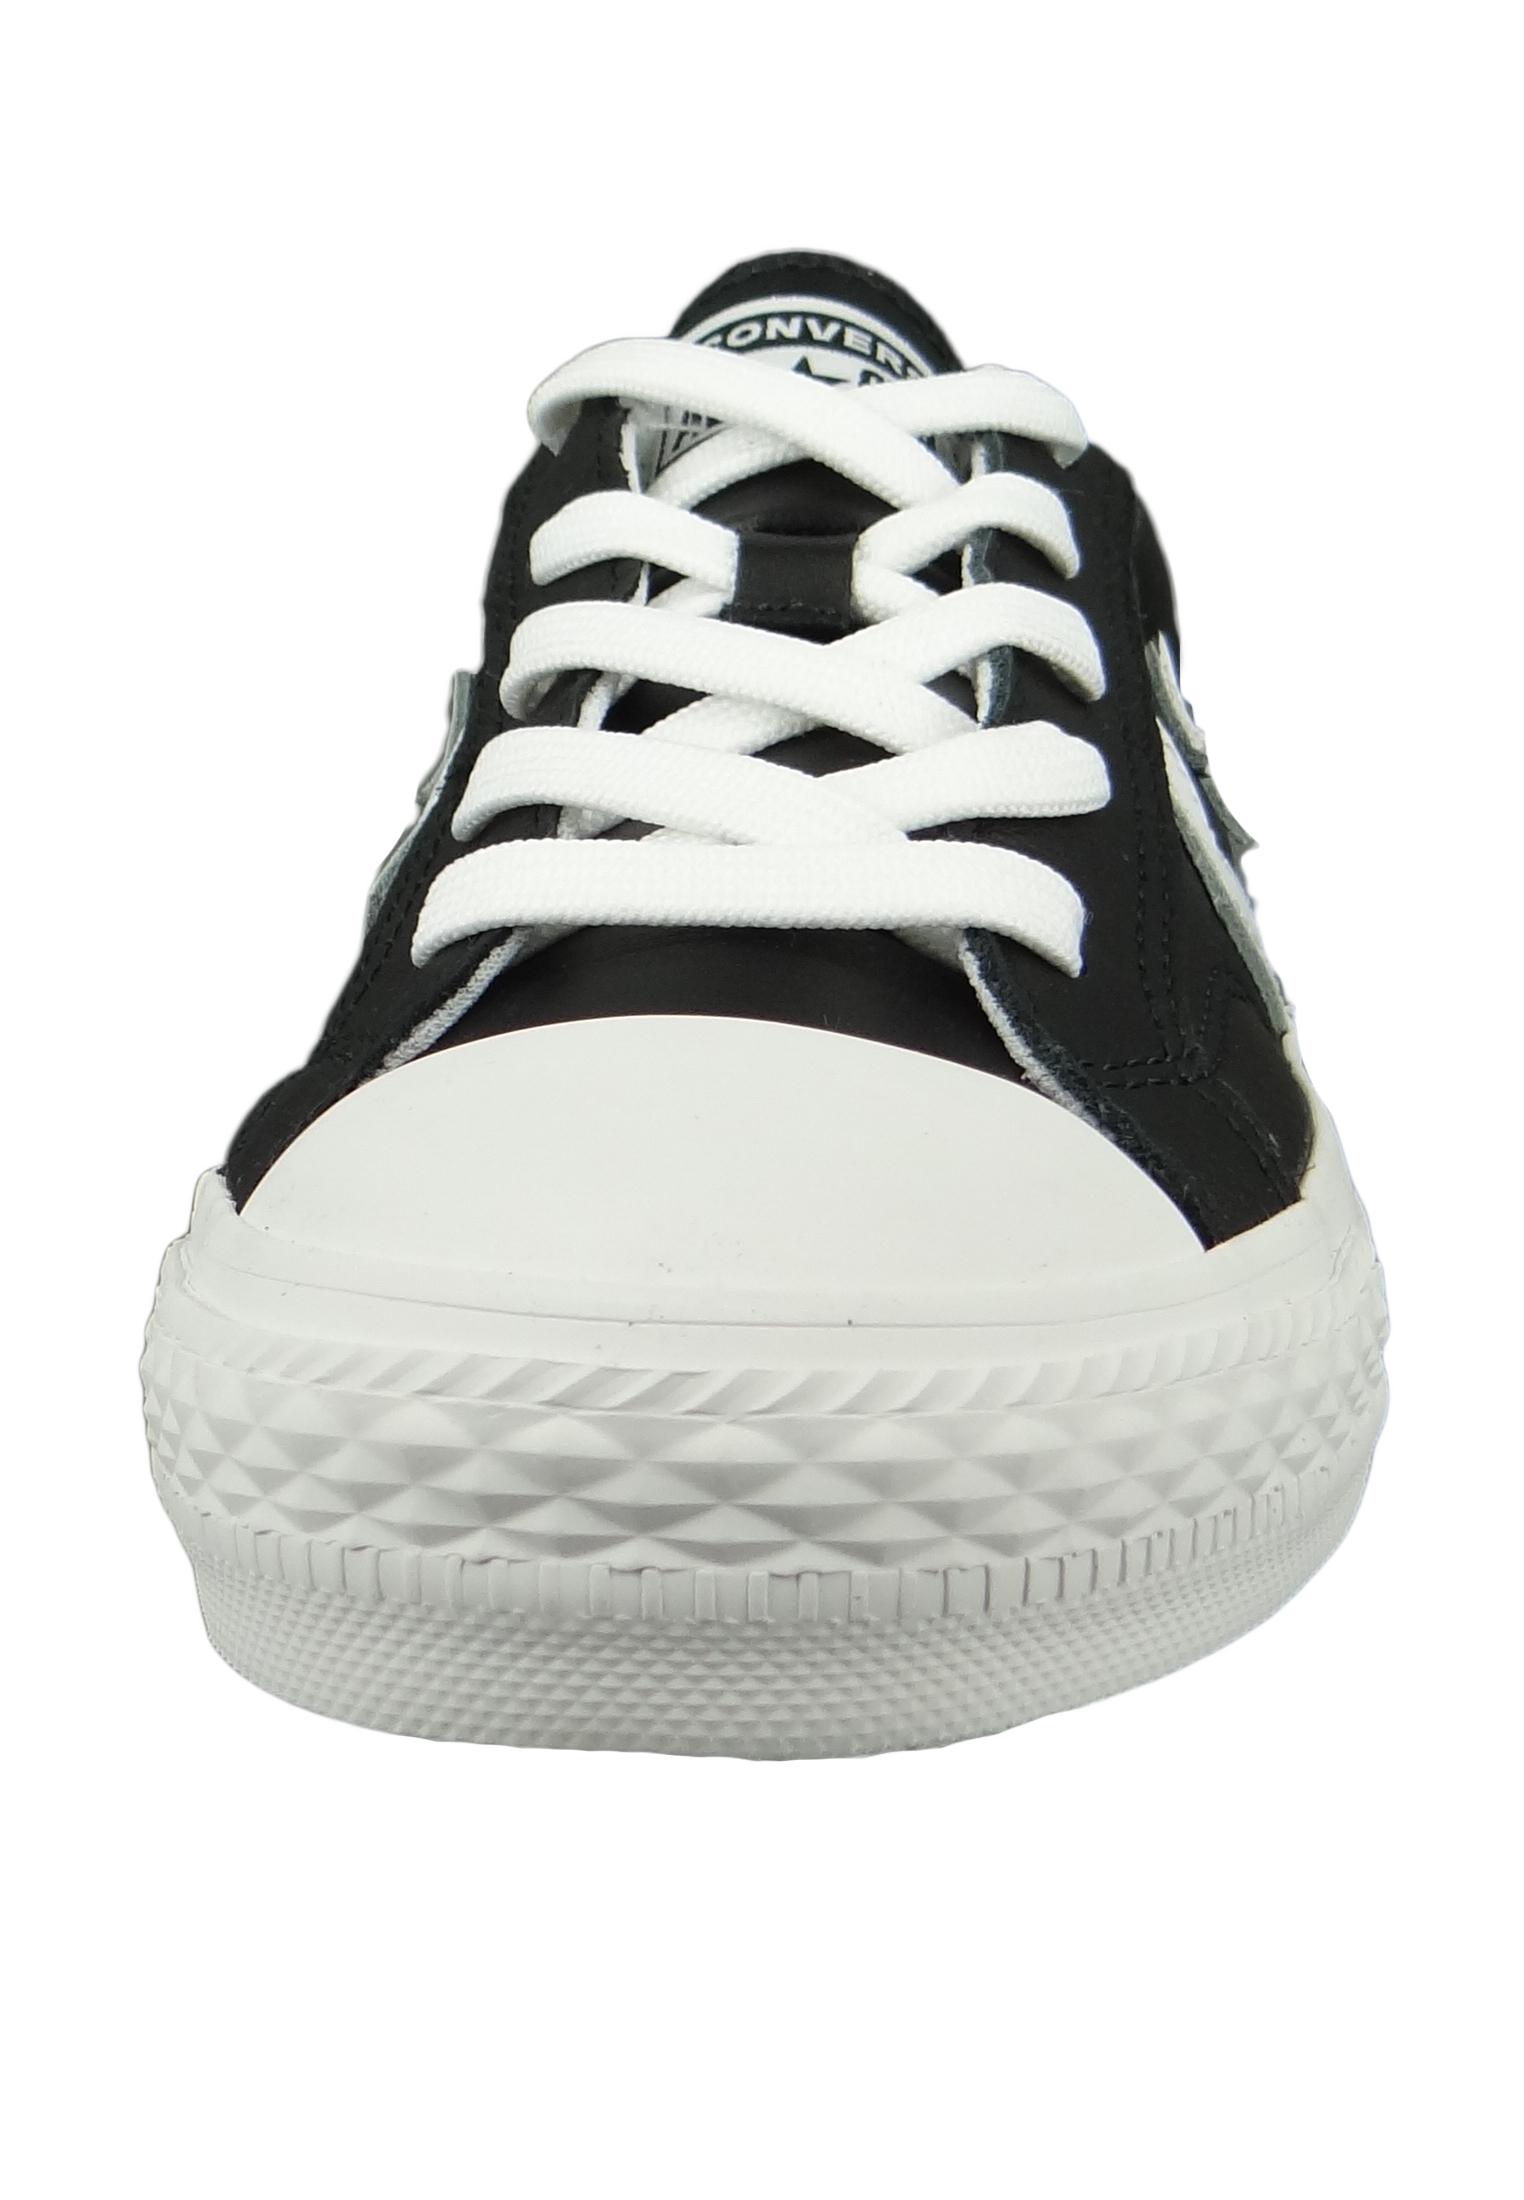 Converse Chucks 159780C Schwarz Star Player OX Leder Black White White